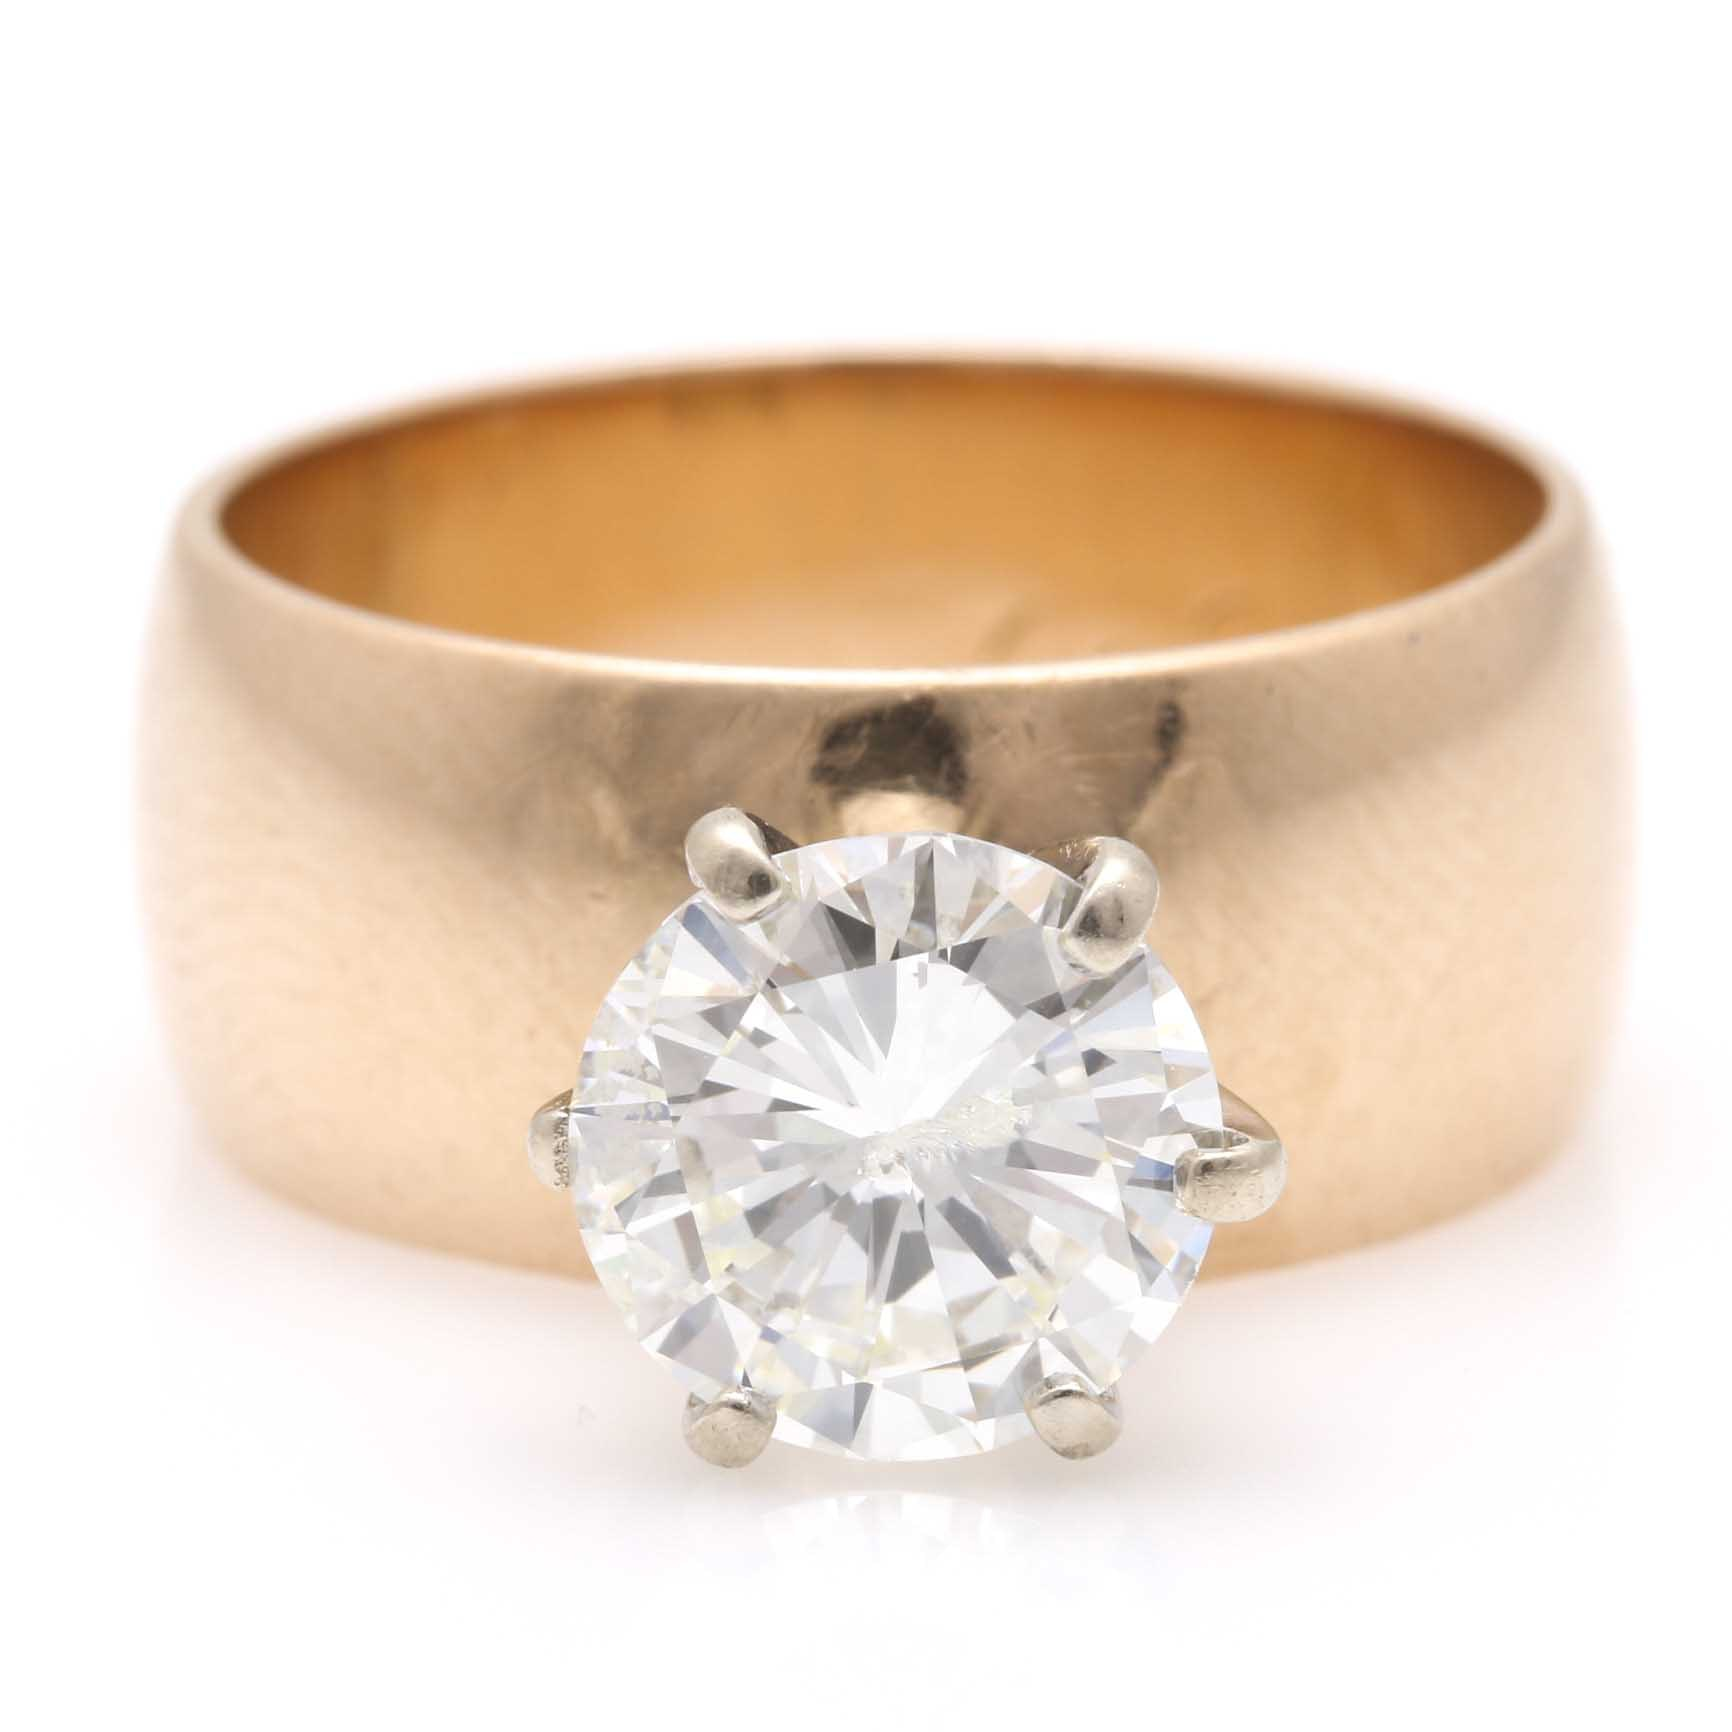 14K Yellow Gold 2.05 CTS Diamond Wedding Ring